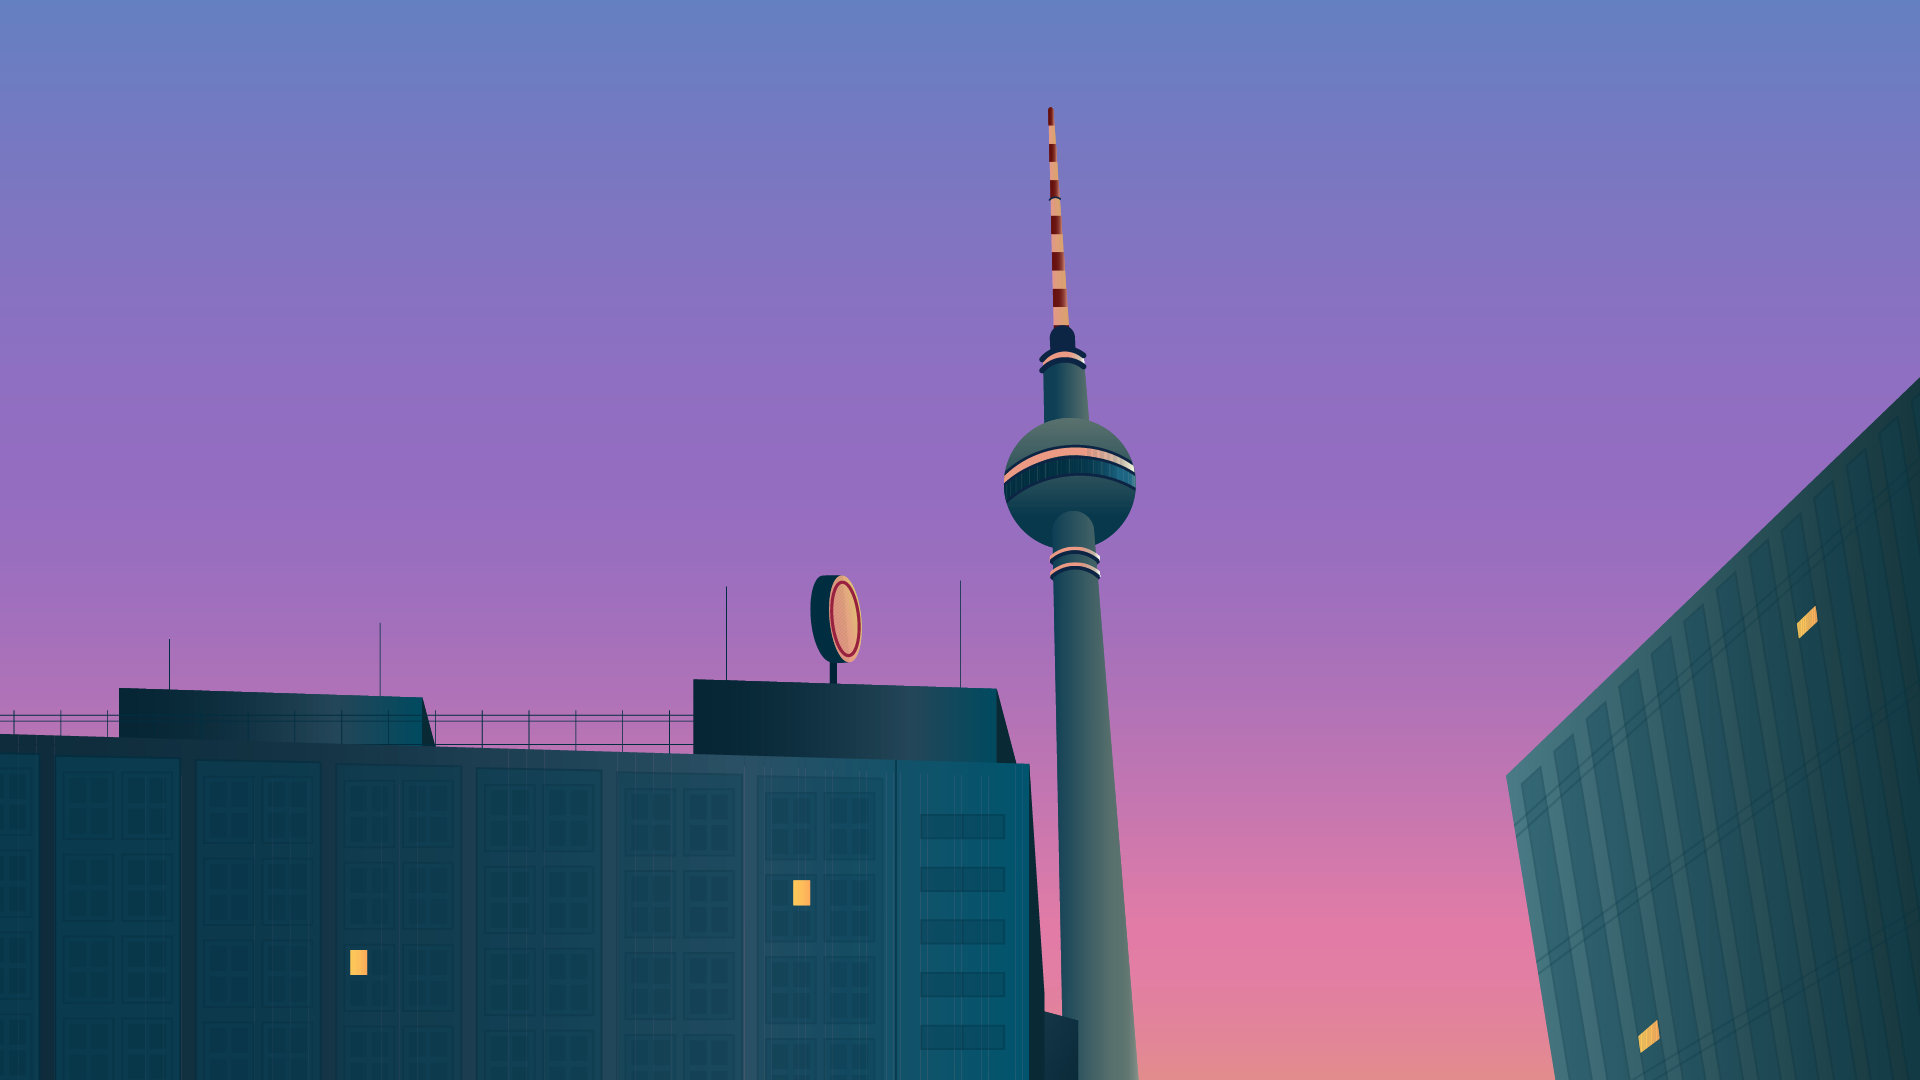 Berlin at Sunset Travelling Illustration